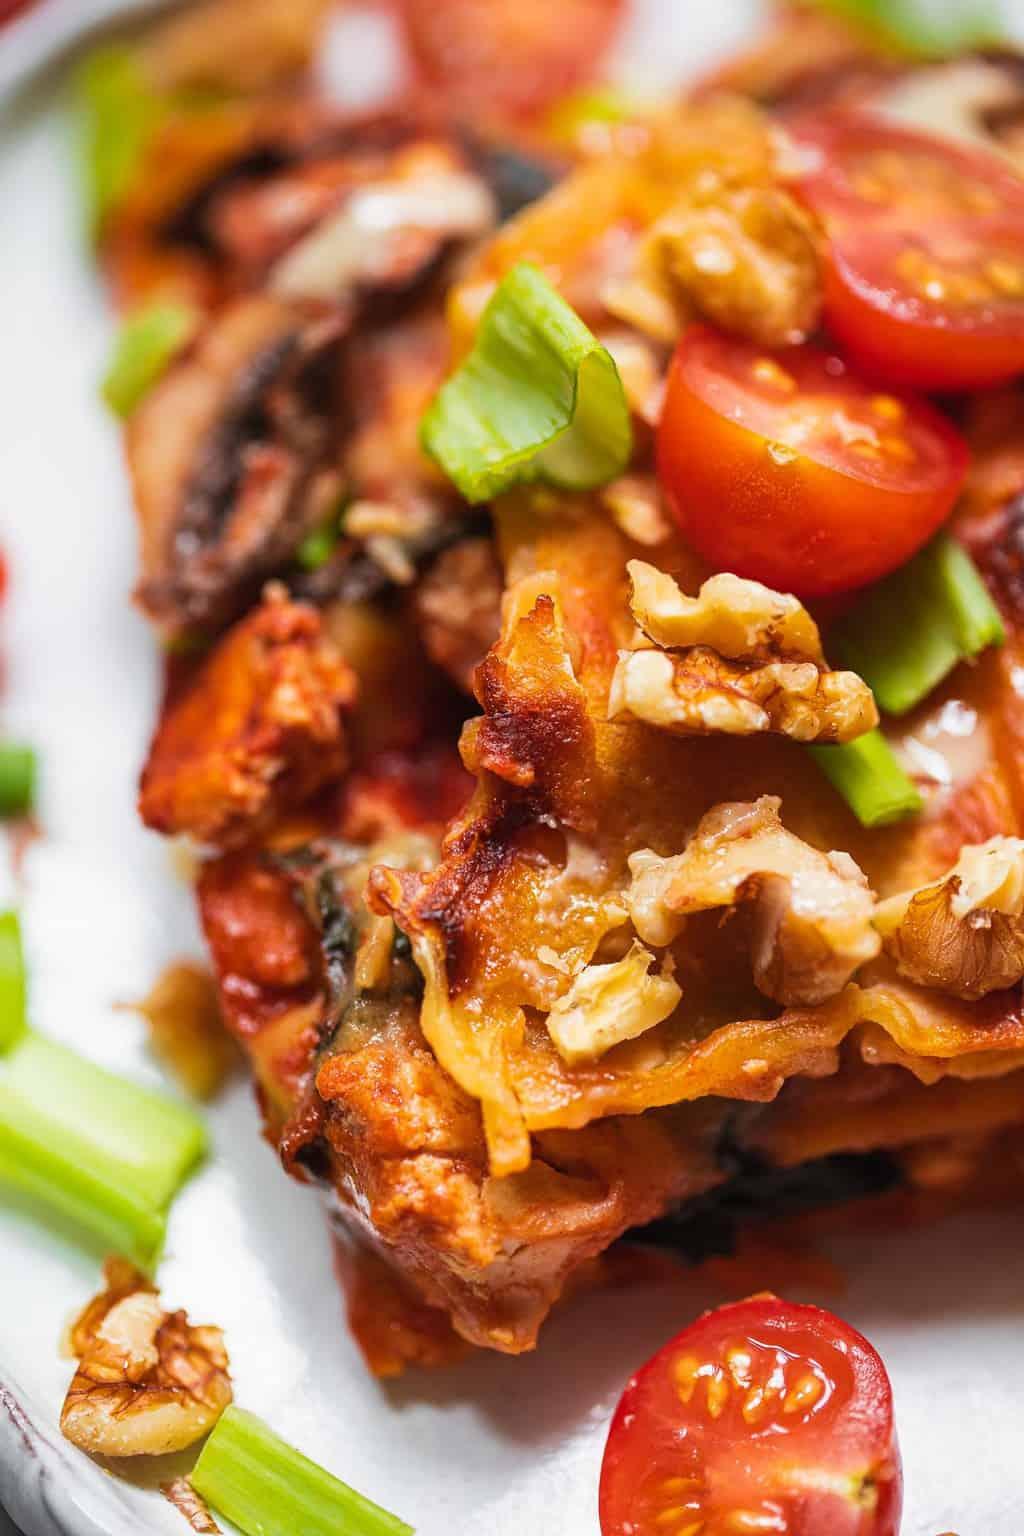 Vegan lasagna with tofu gluten-free oil-free